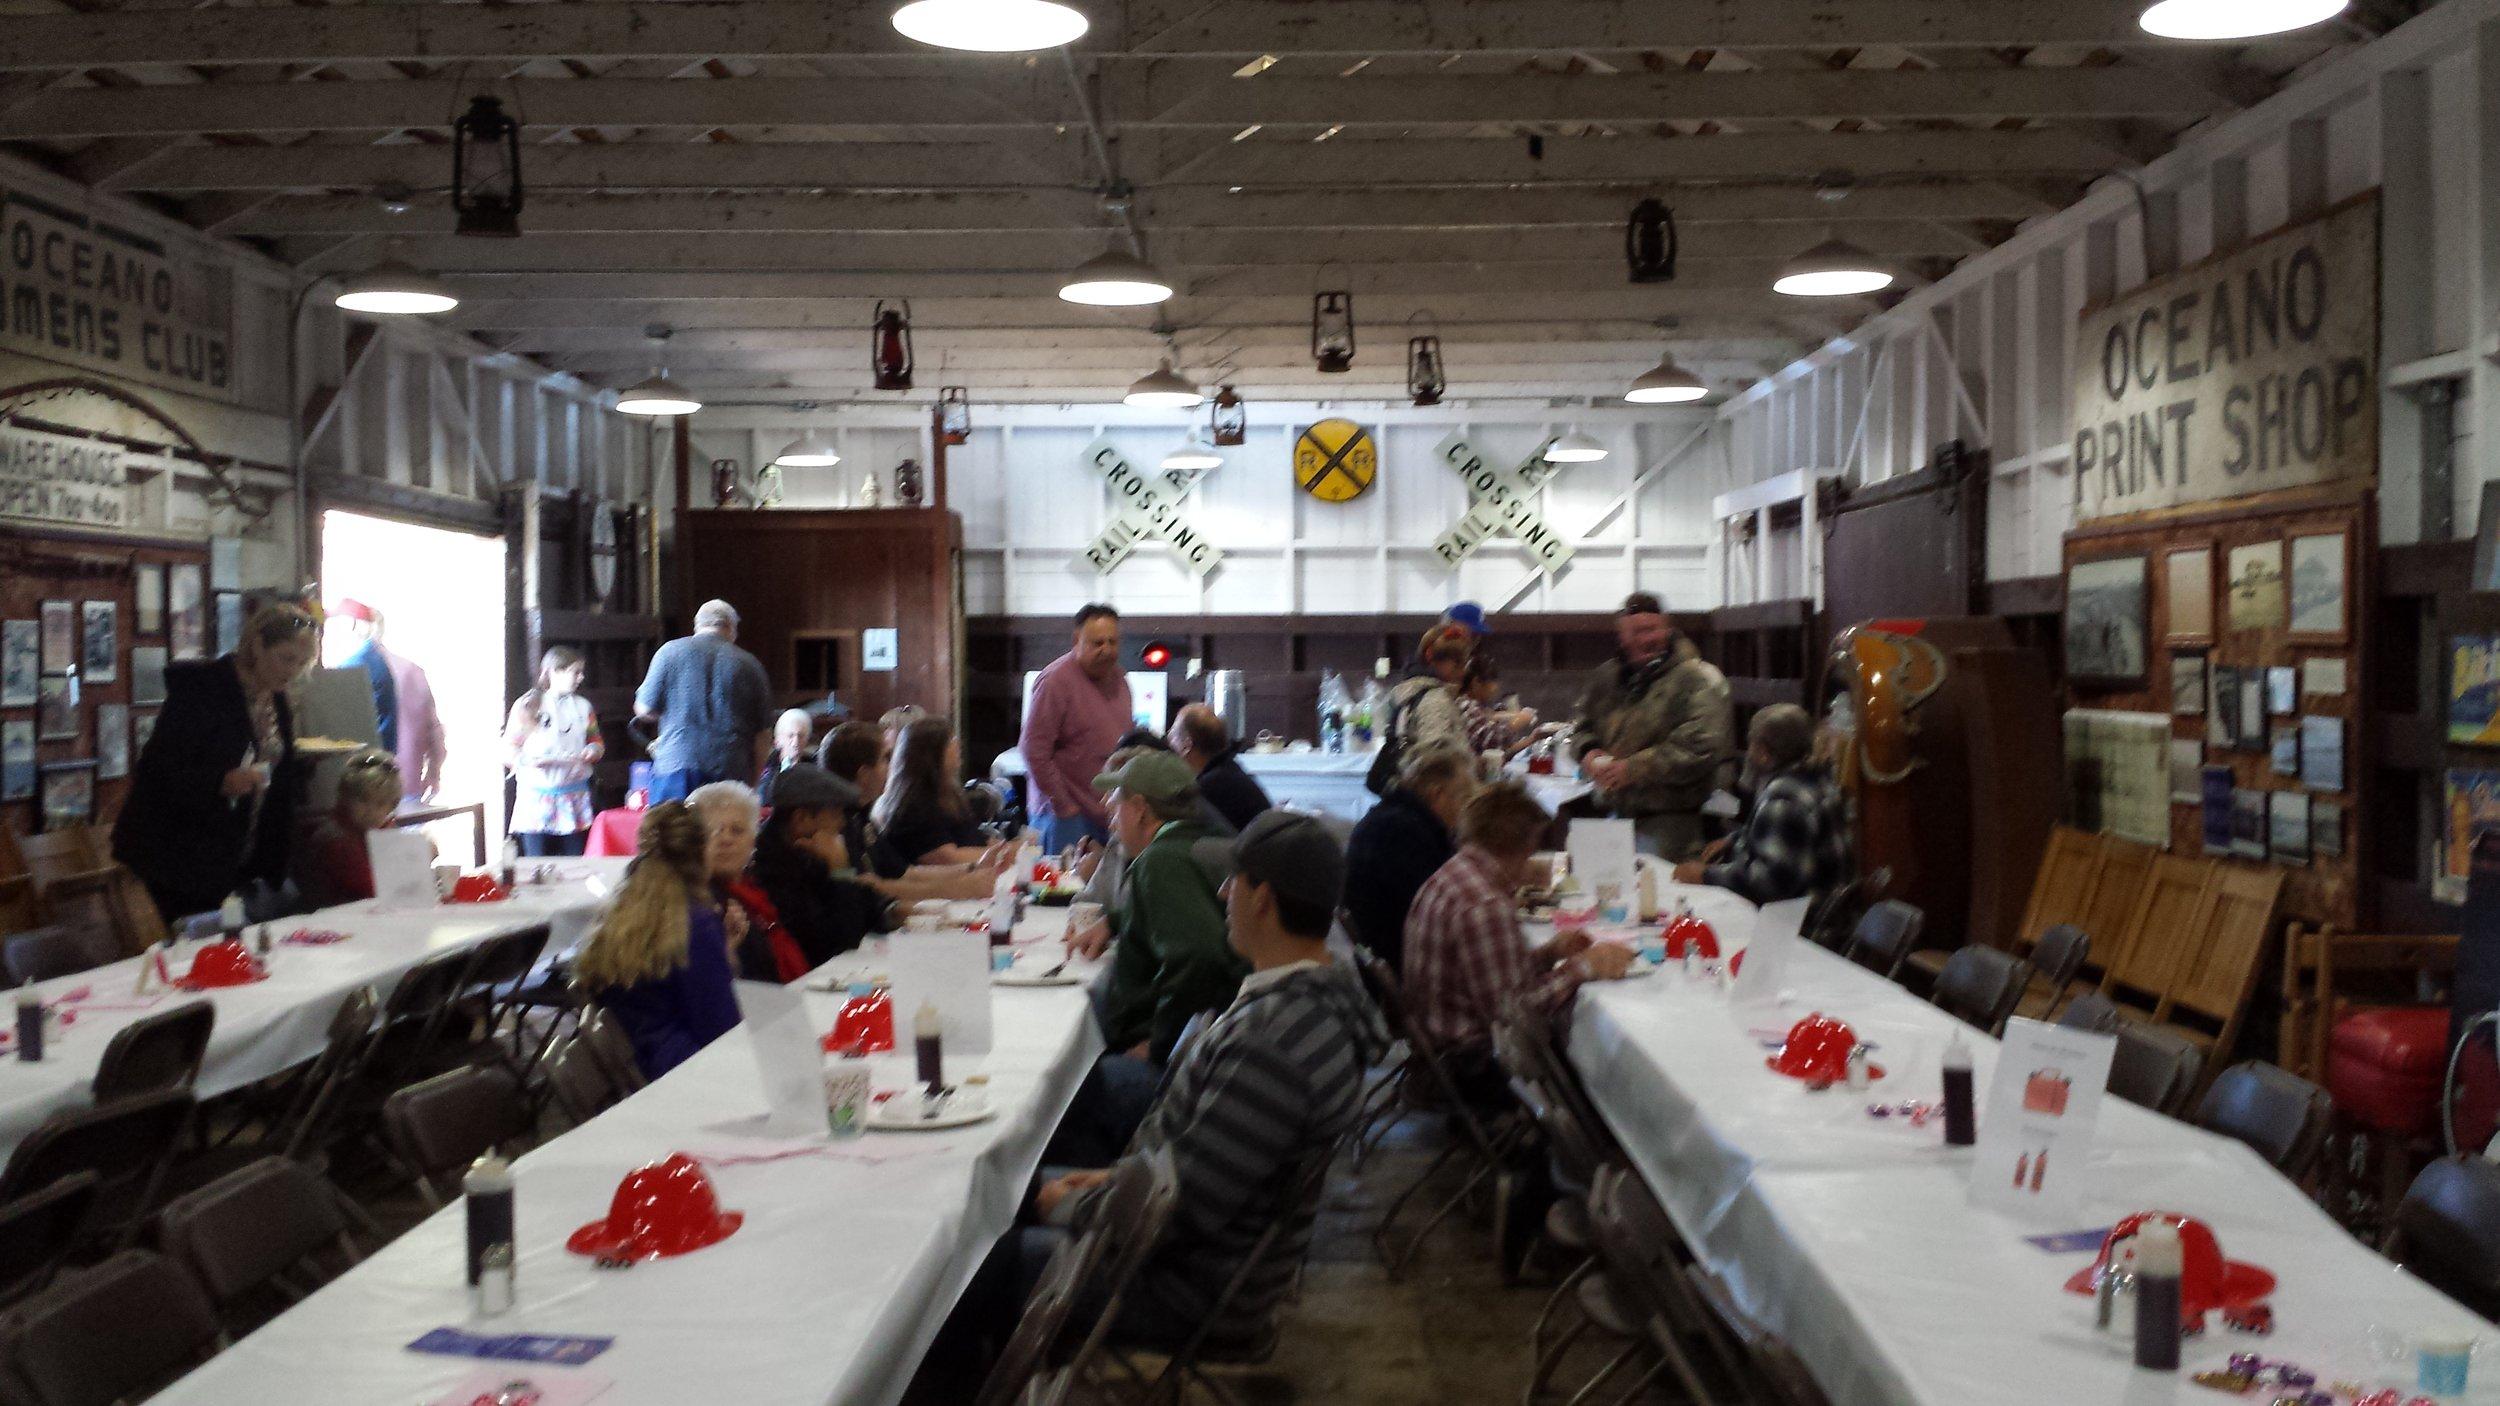 Oceano Kiwanis Club sponsored a Pancake Breakfast benefiting Friends of Five Cities Fire Authority.